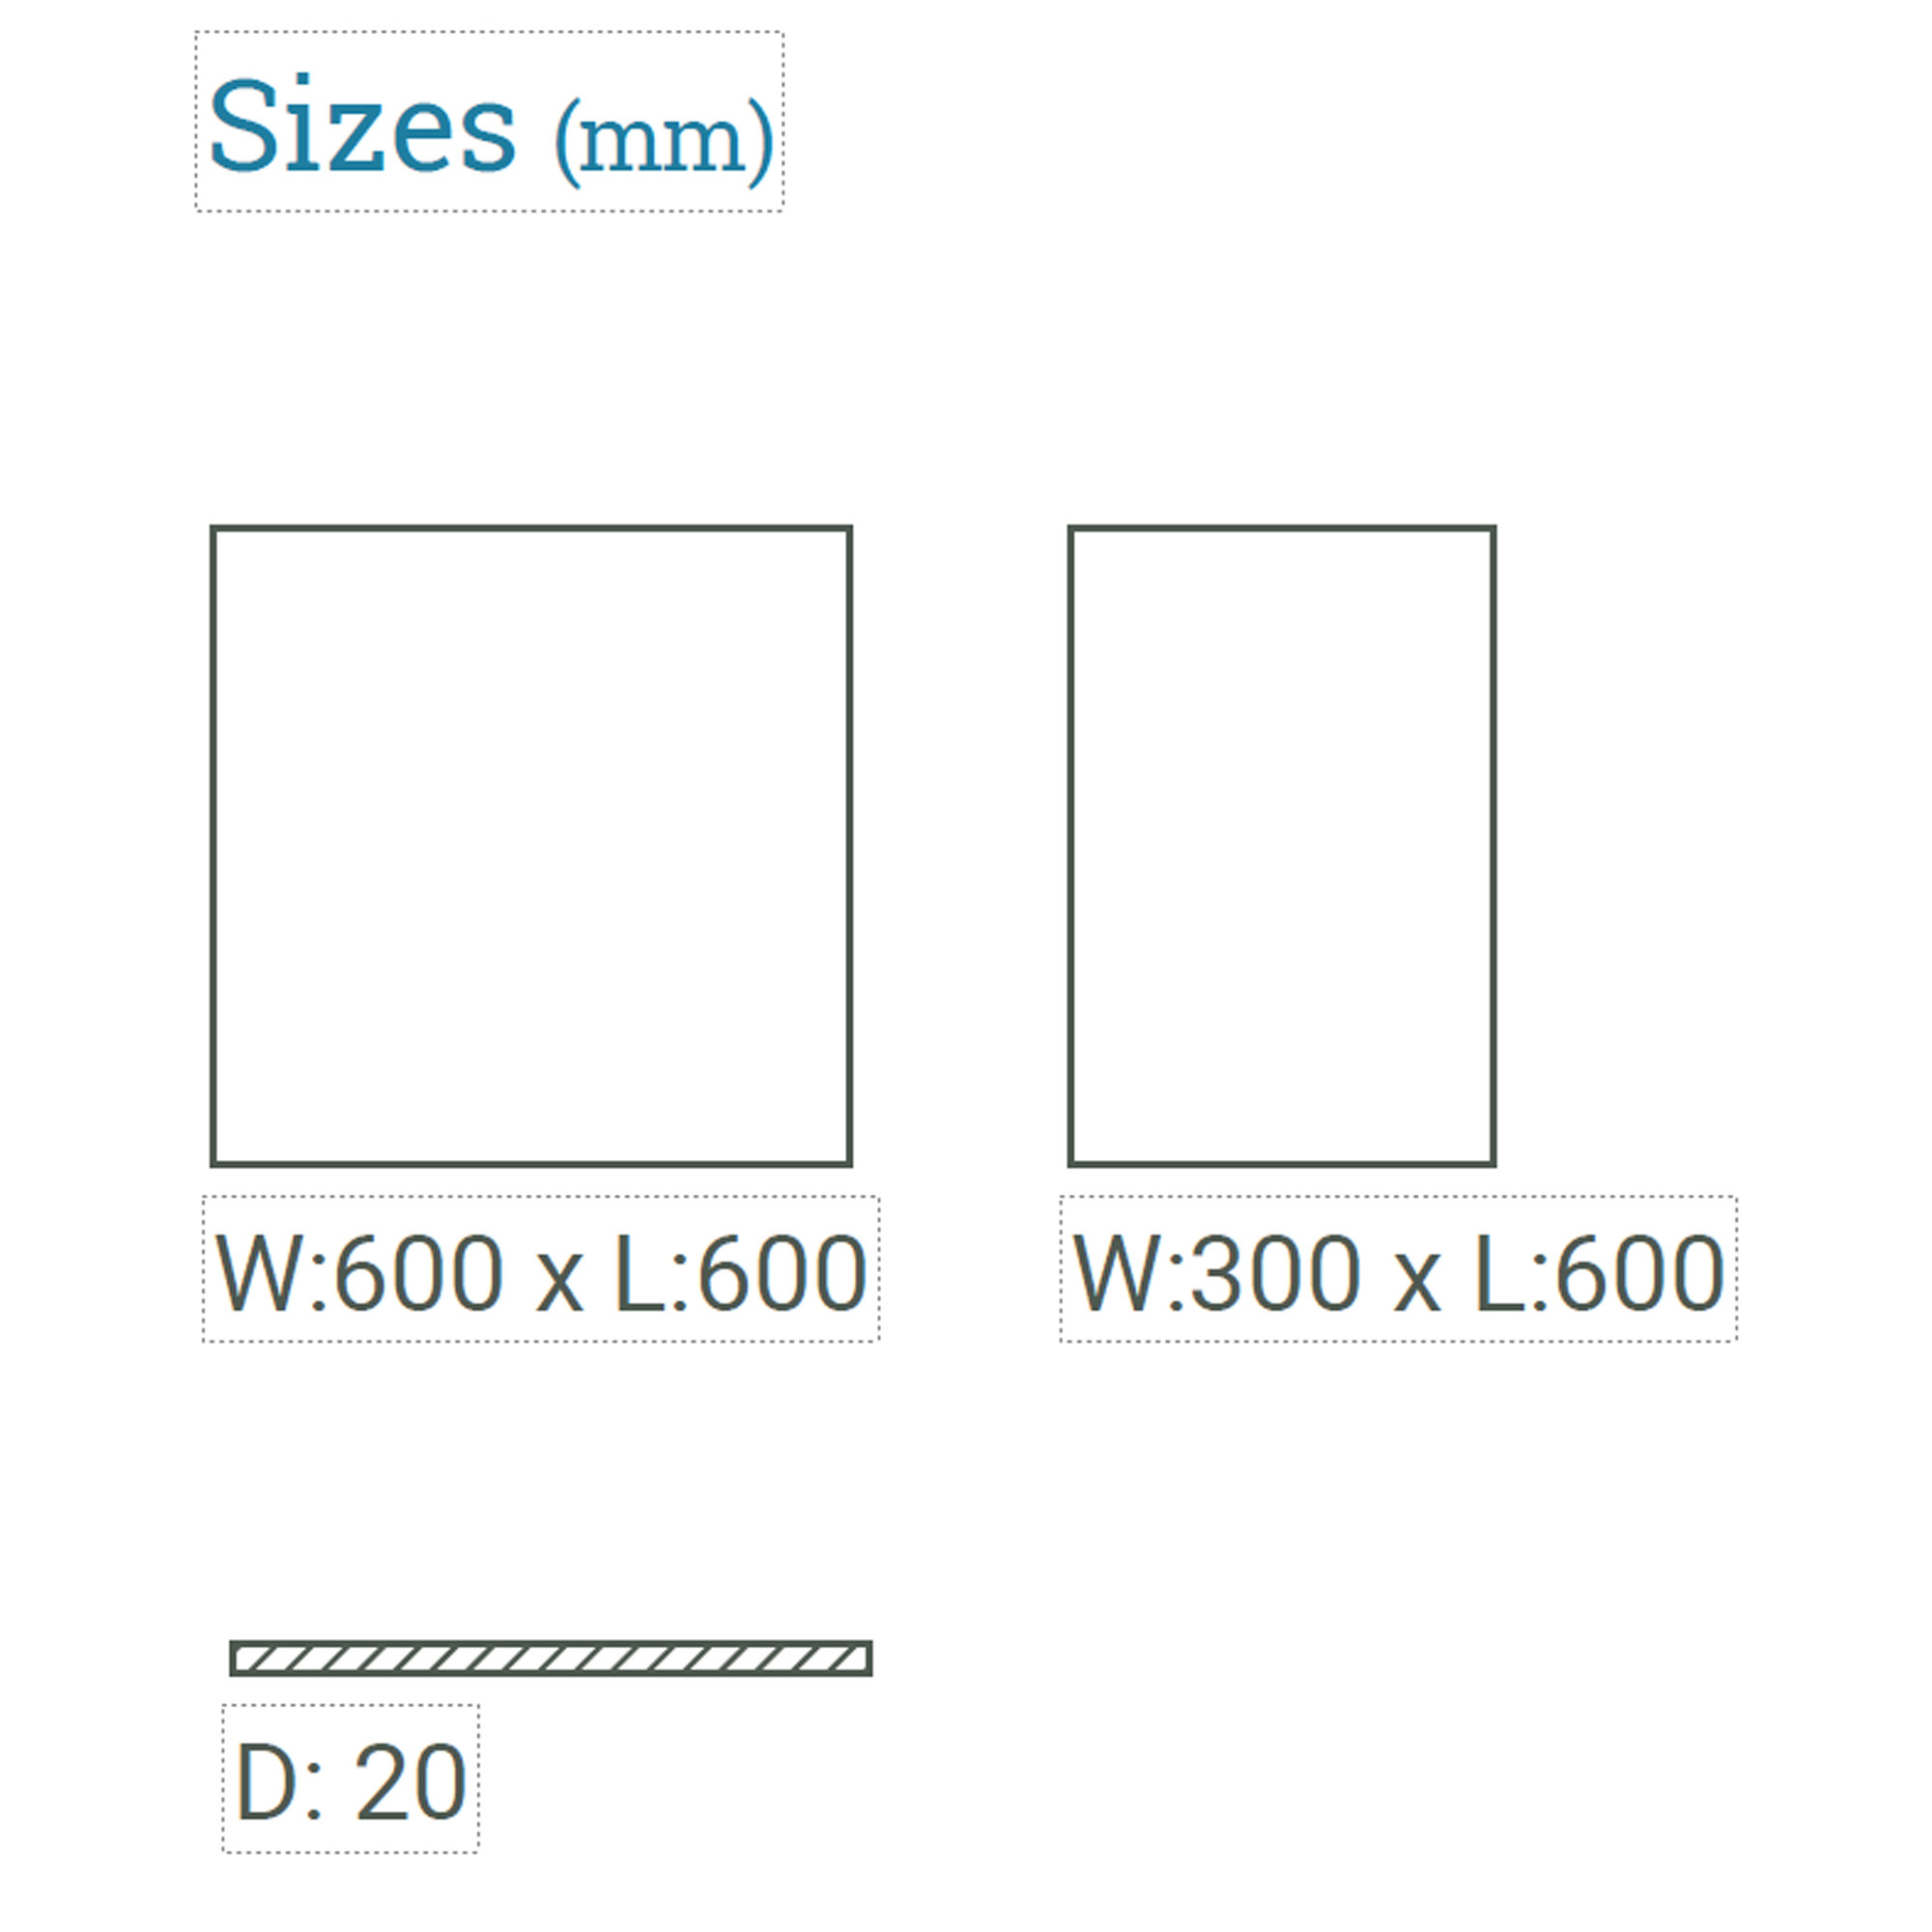 Kilkenny Limestone Paving sizes available